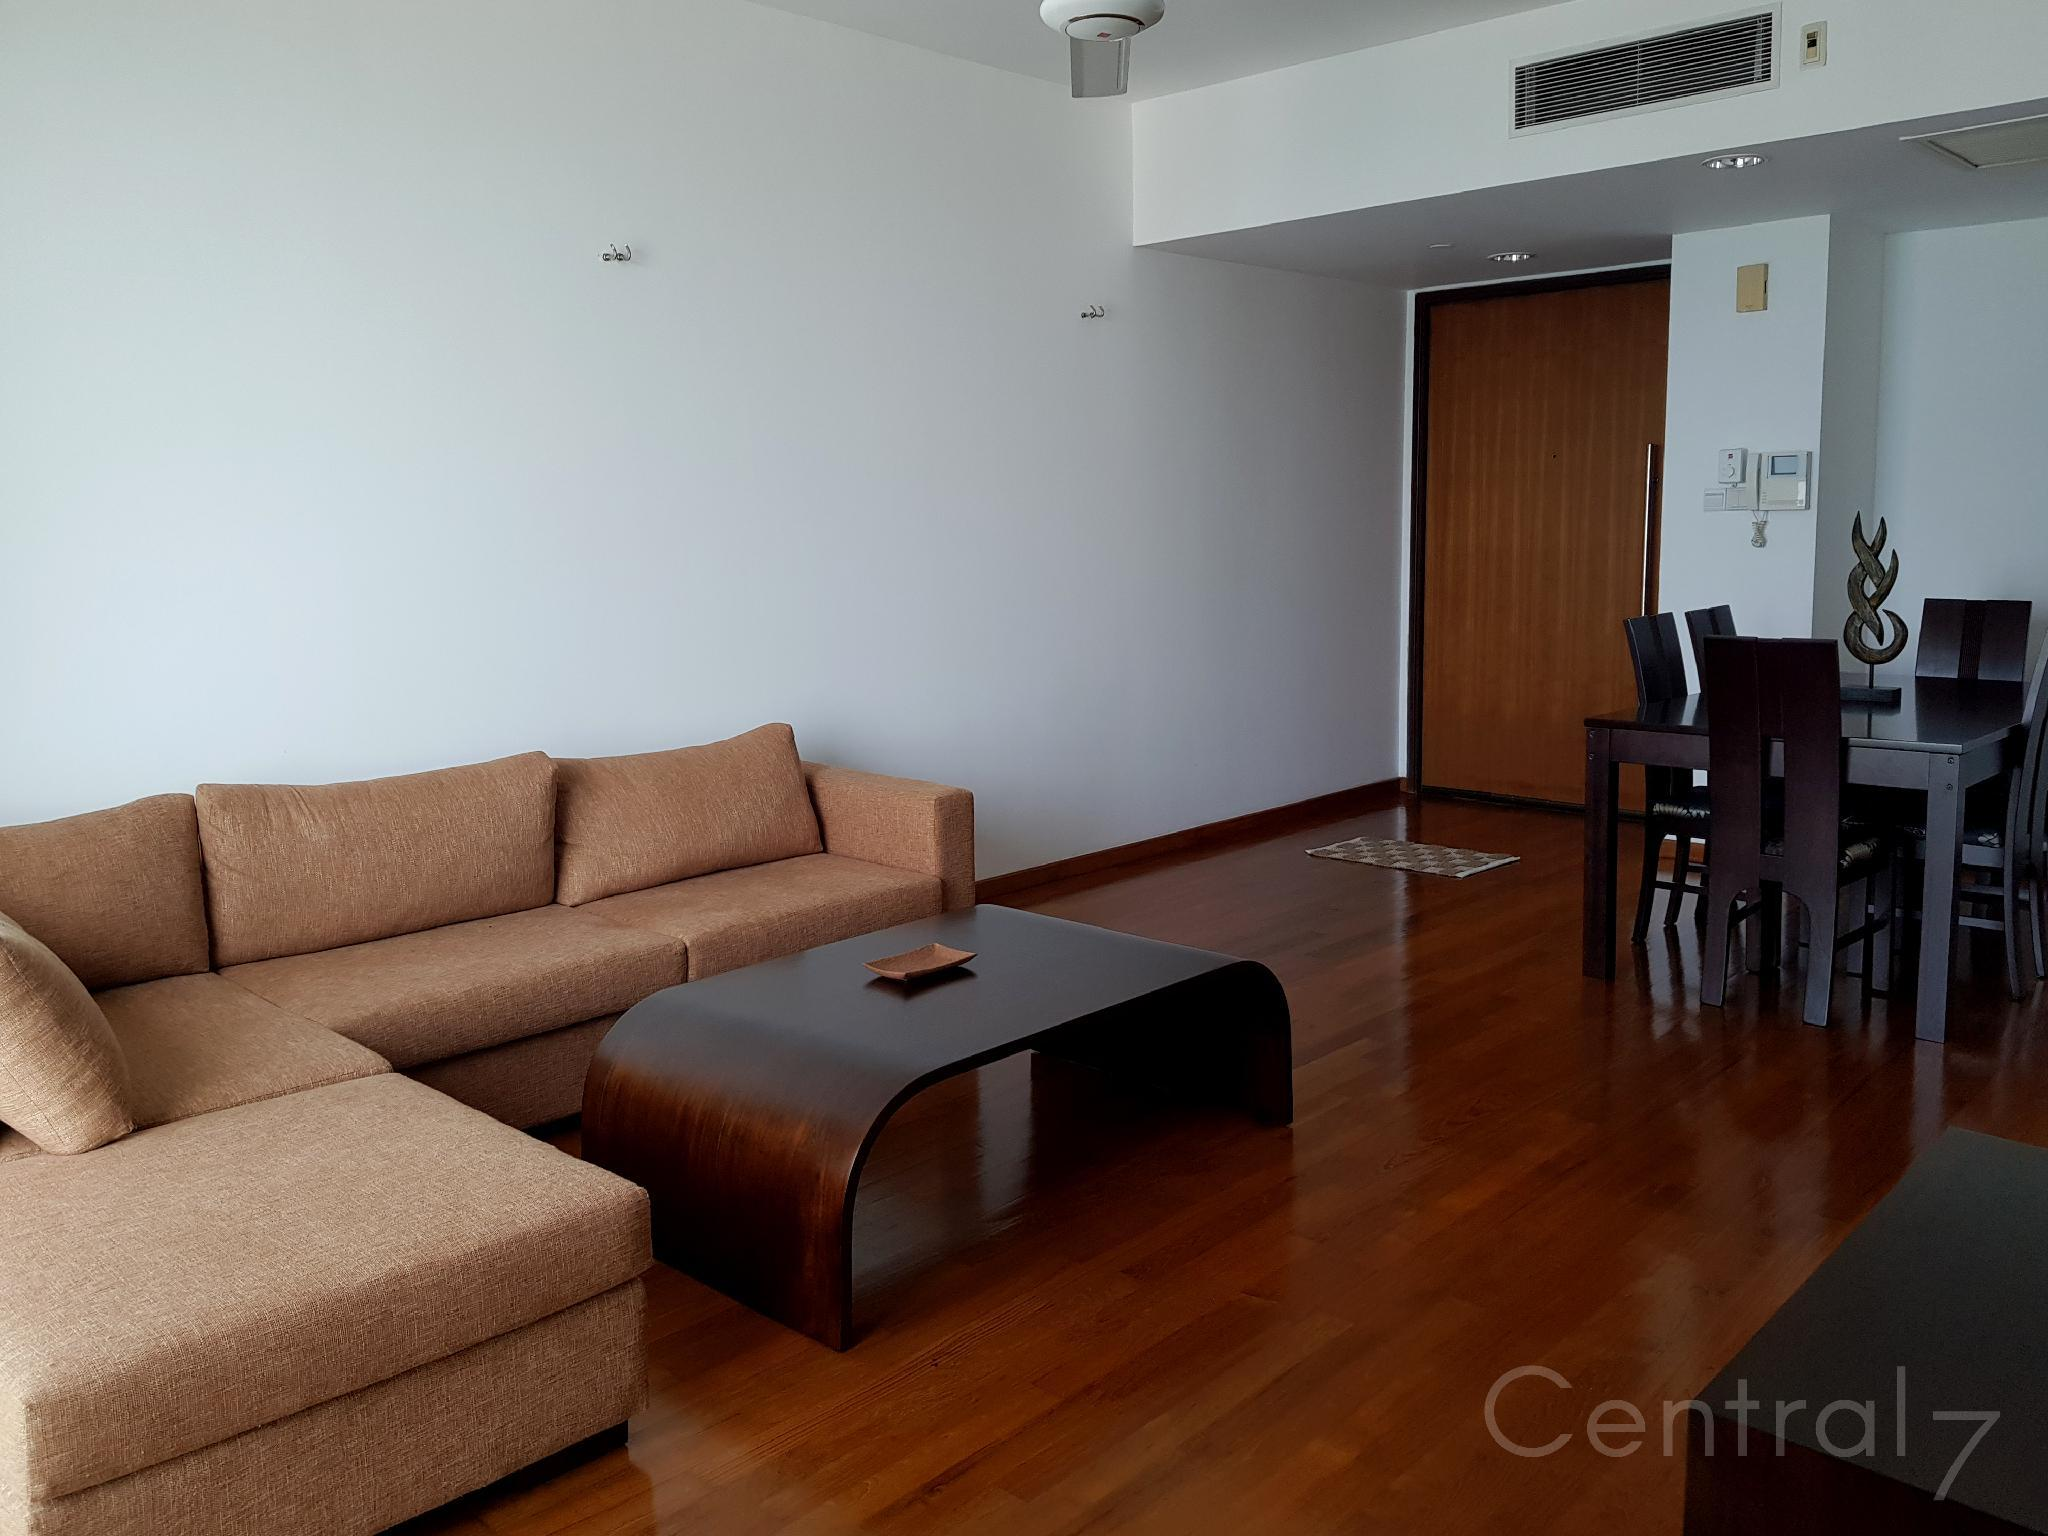 Monarch Apartments Kollupitiya By Central7